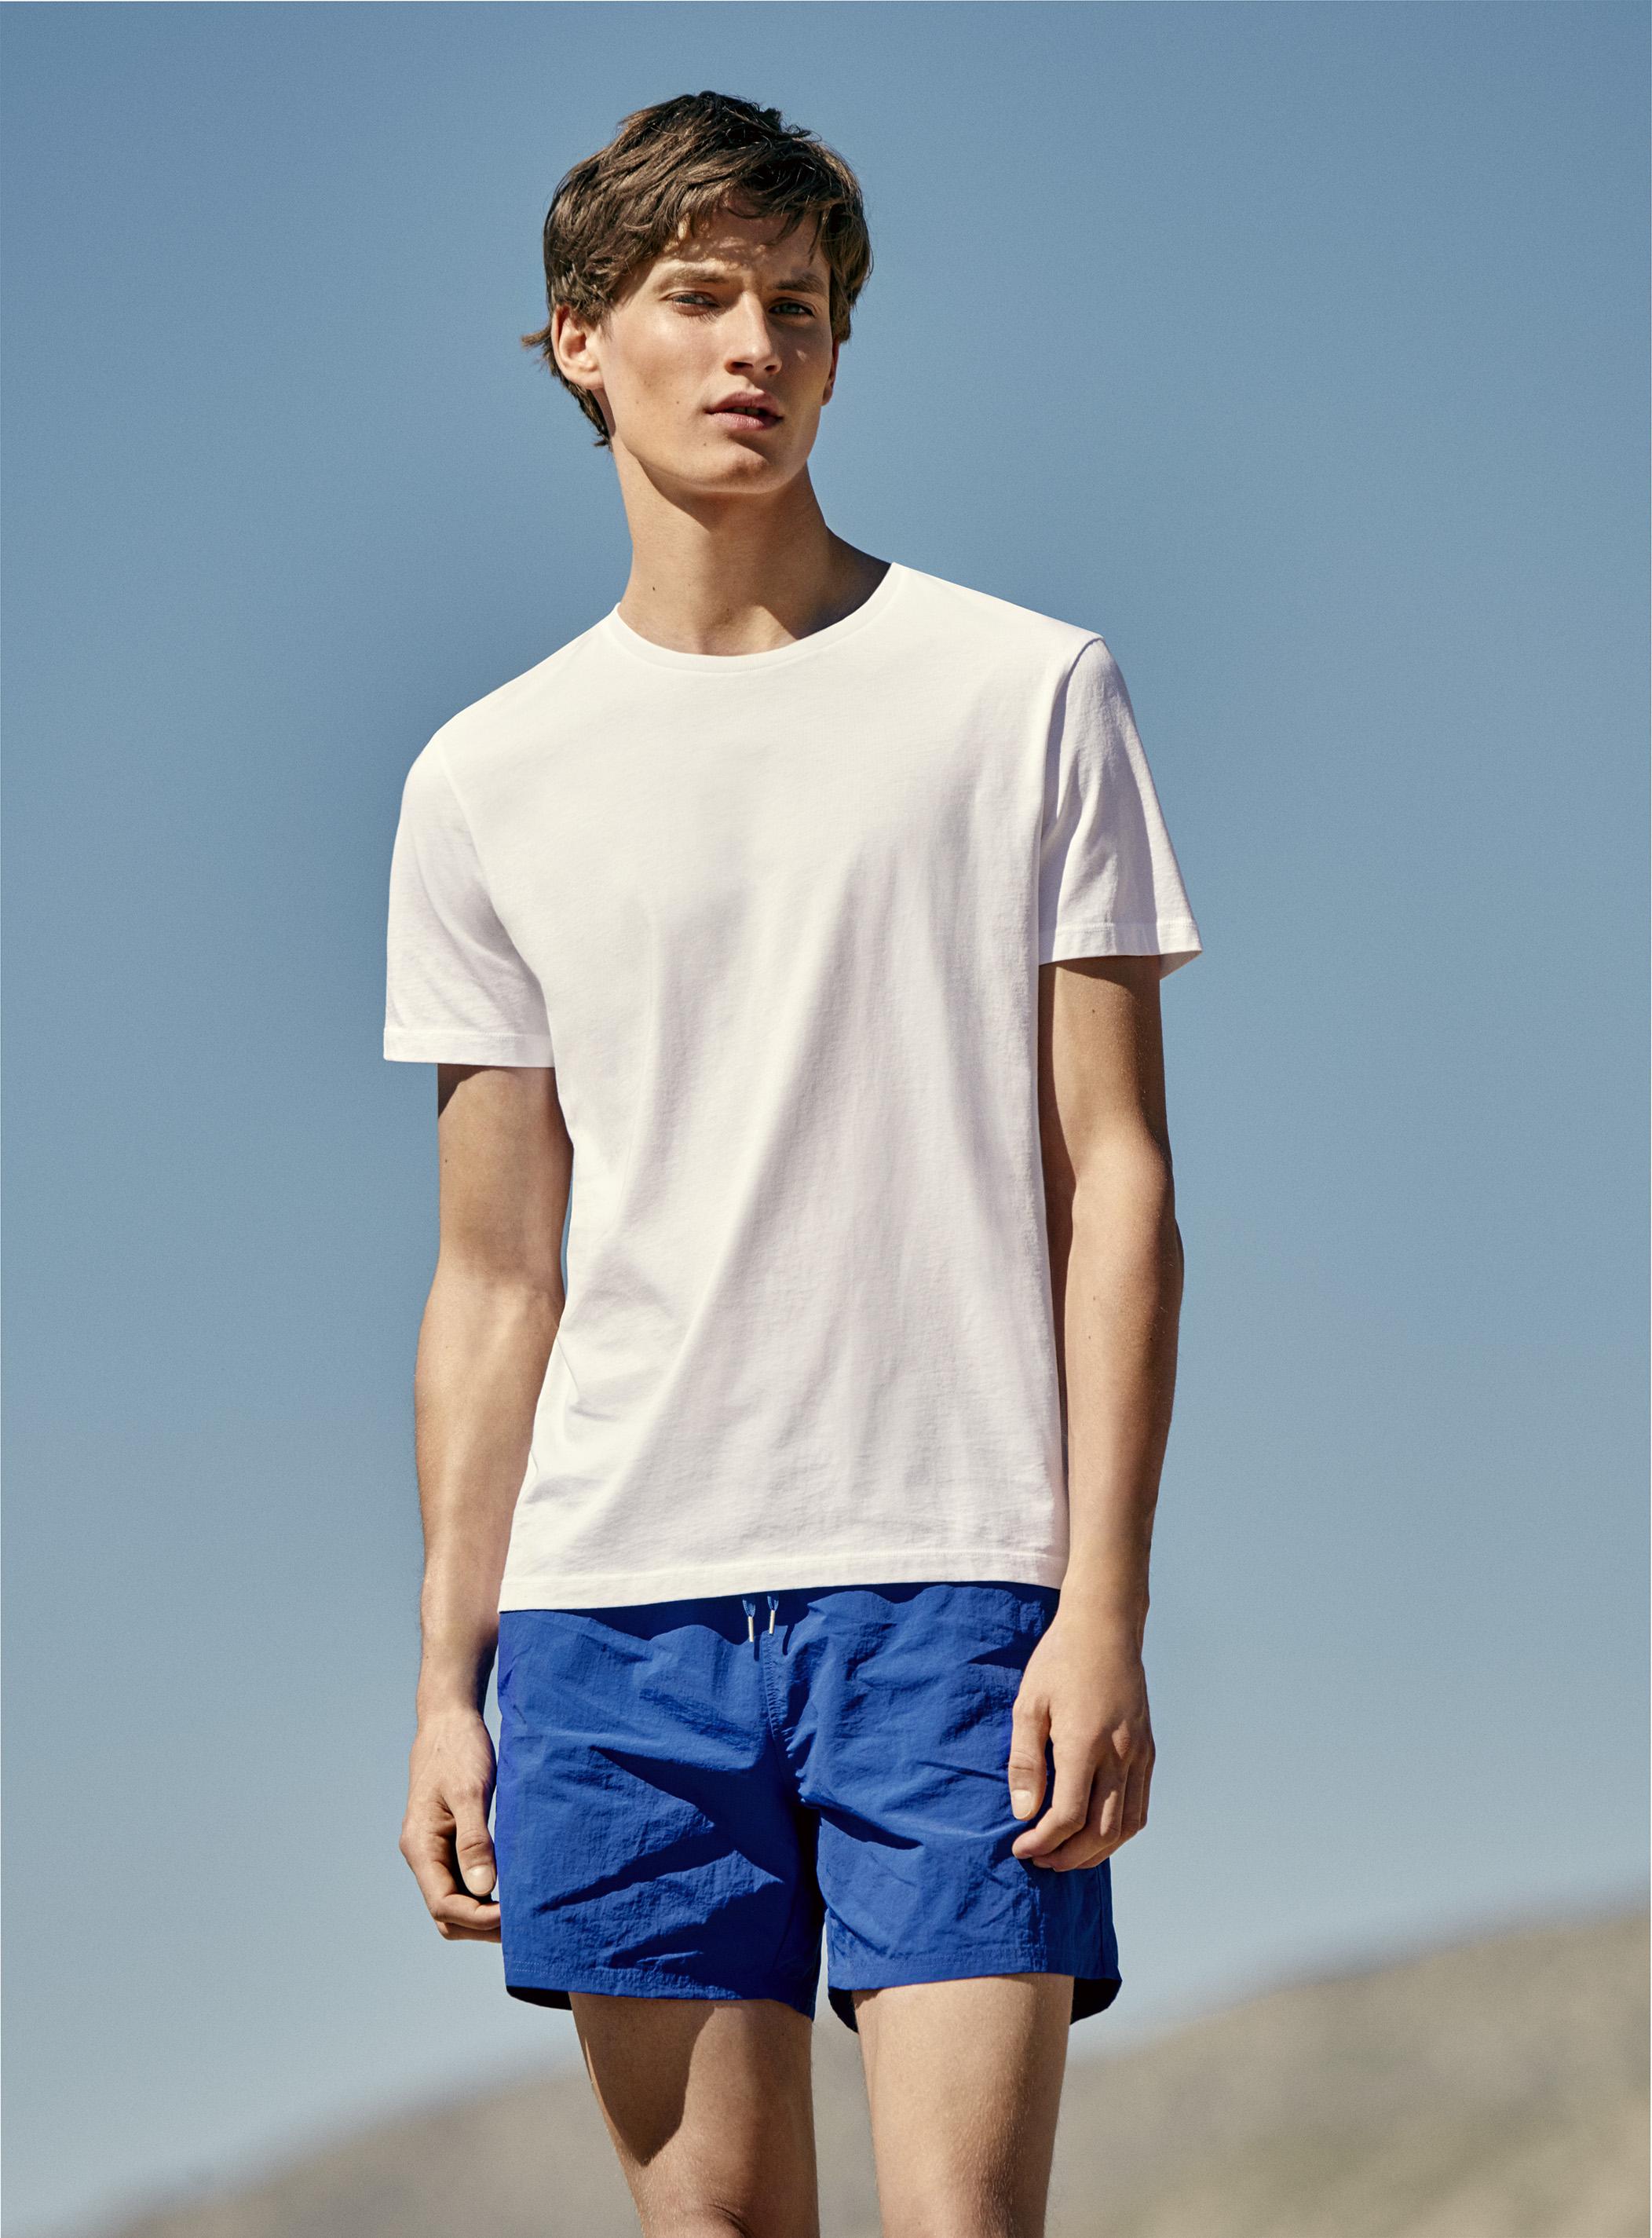 Oversized Cotton t-shirt (25€) + Lightweight swim shorts (45€)